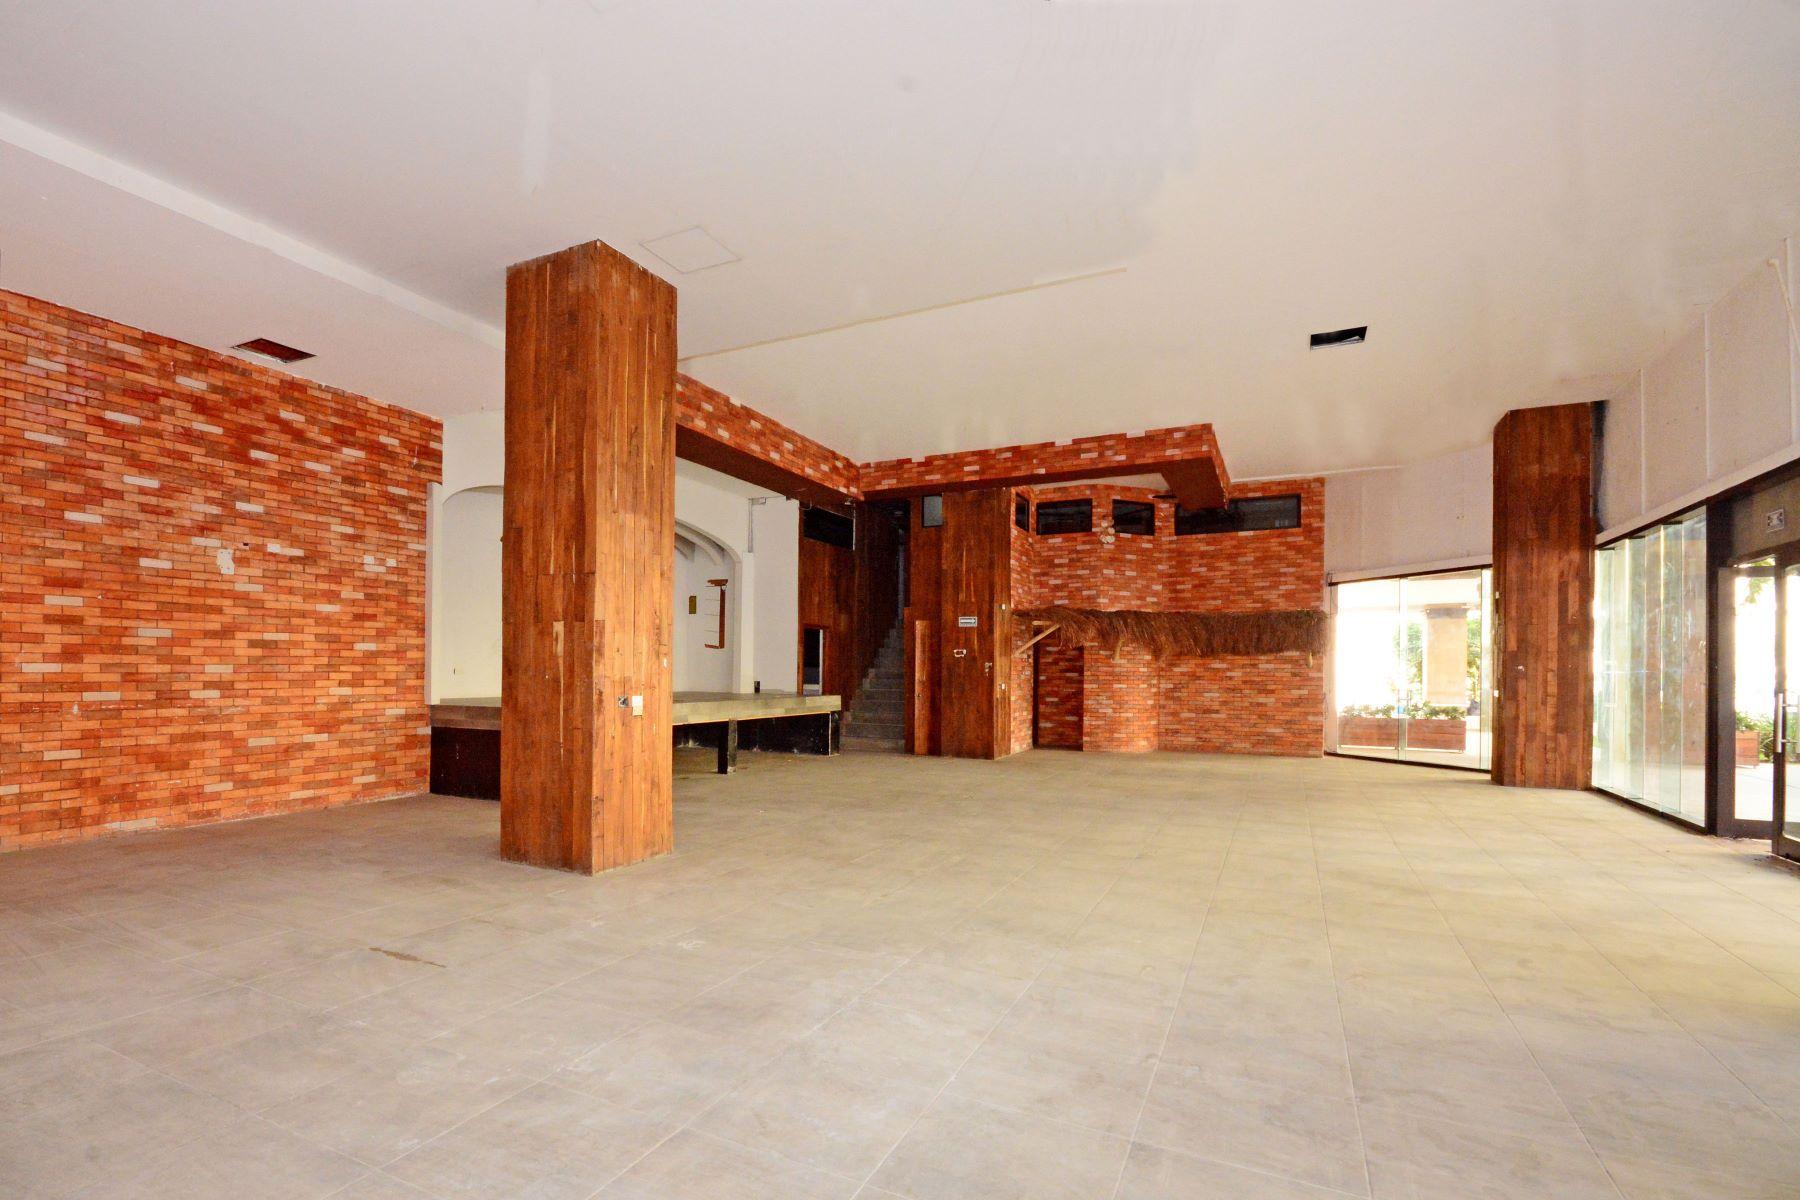 Additional photo for property listing at ALDEA THAI 22 COMMERCIAL SPACE Aldea Thai #22 Avenida Cozumel entre las Calles 26 y 28 Norte Playa Del Carmen, Quintana Roo 77710 México